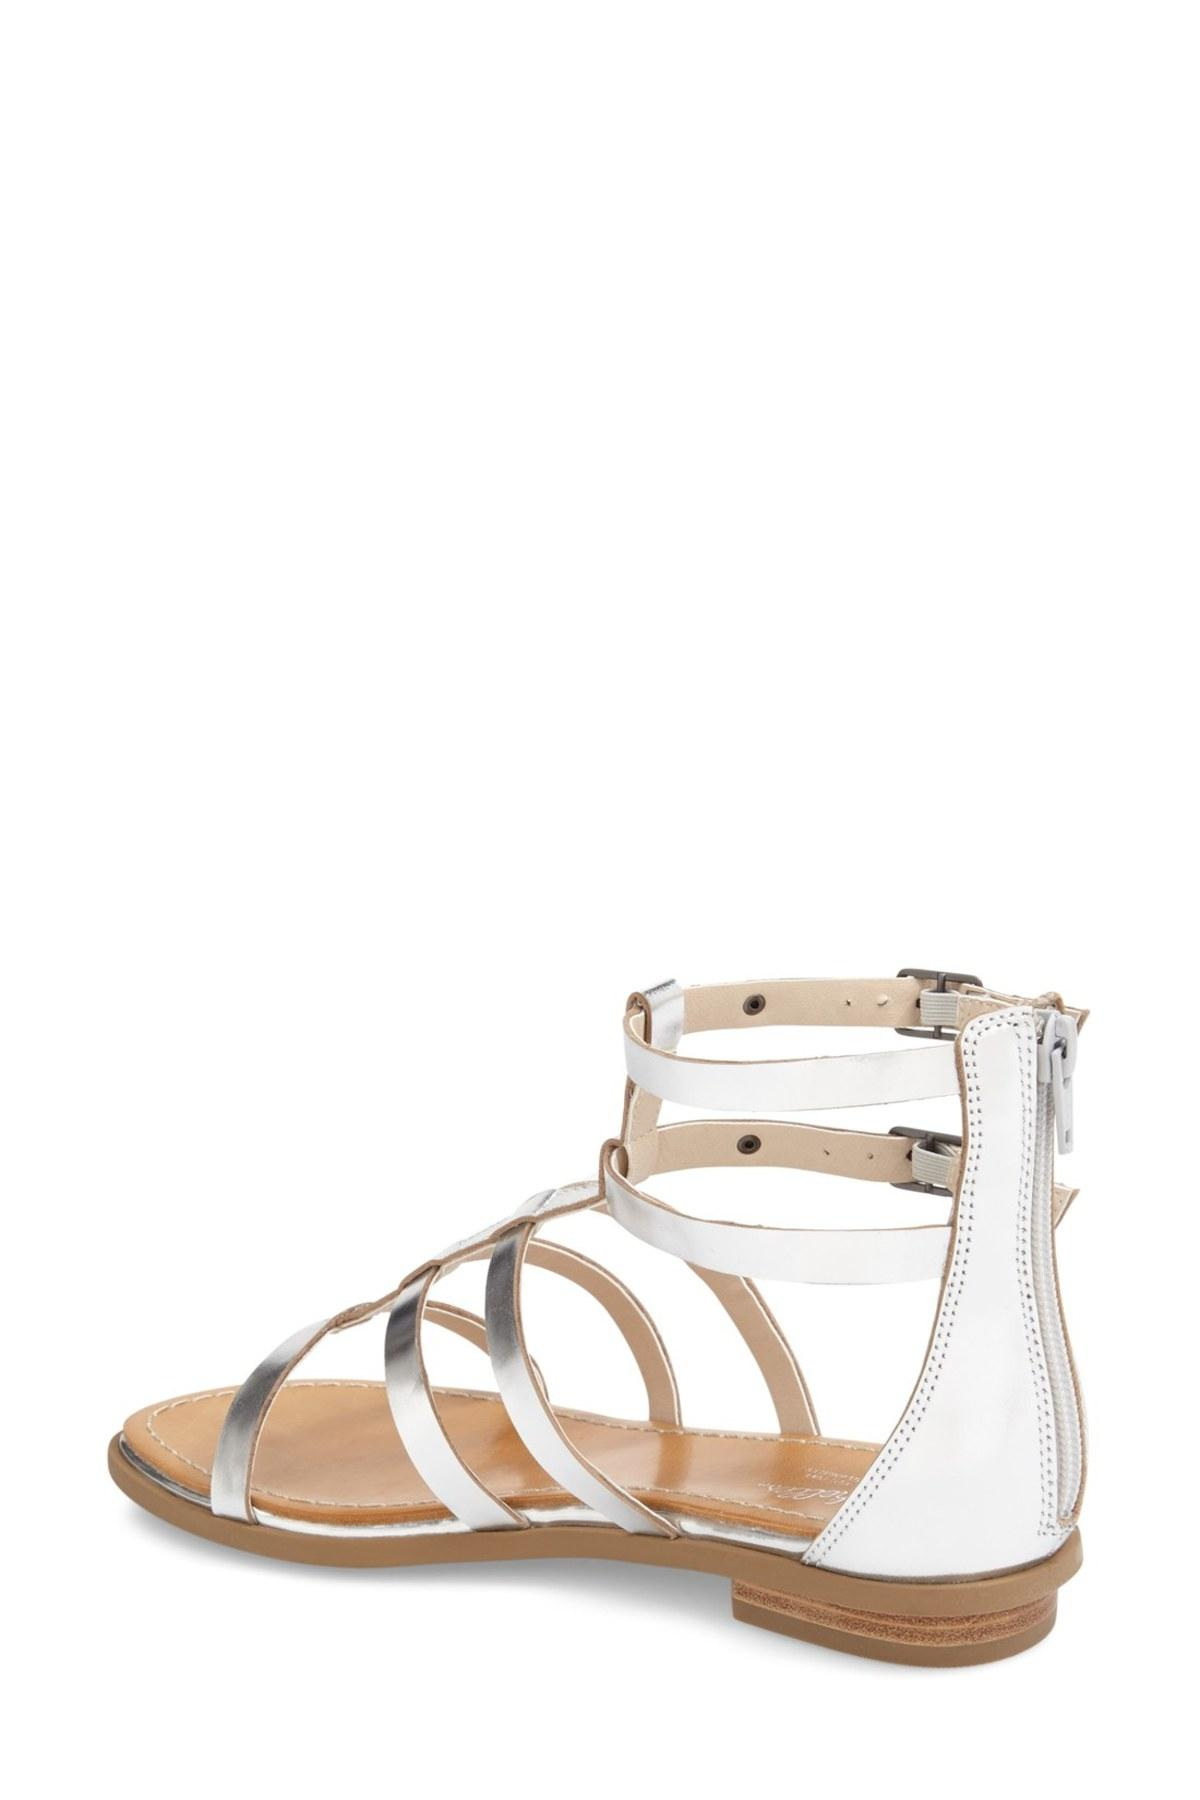 be1ae7d537ae0 Lyst - Seychelles 'peachy' Gladiator Flat Sandal (women) in Metallic